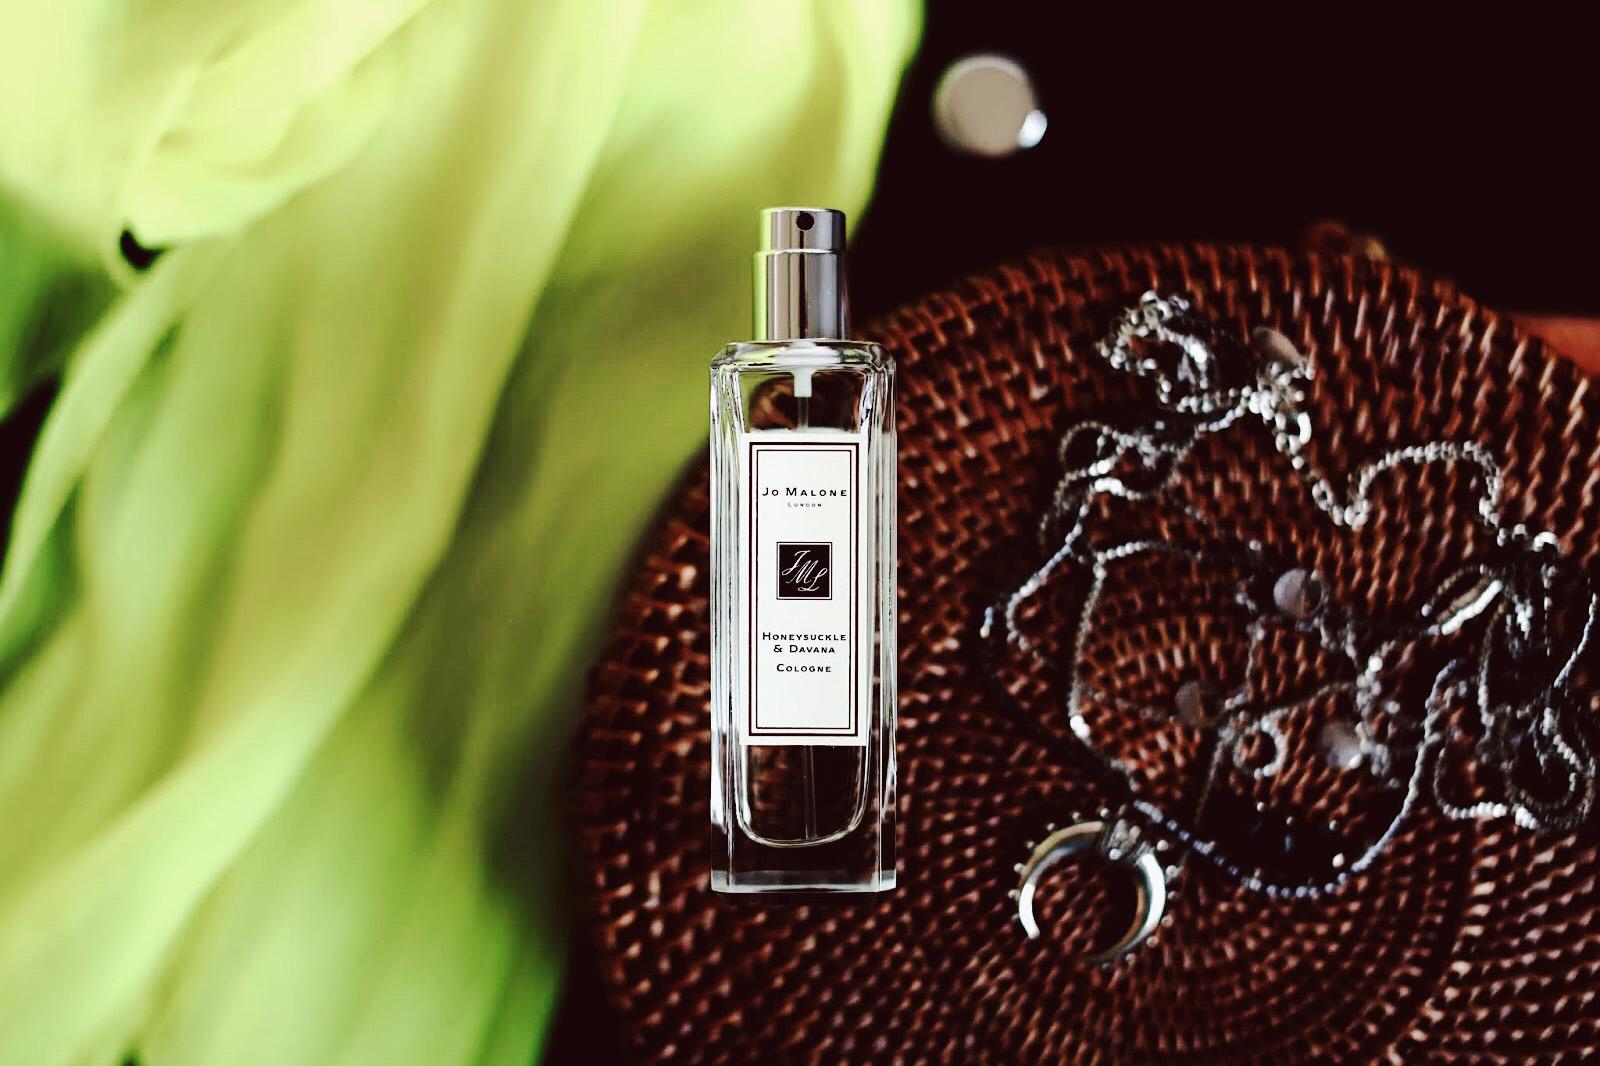 jo malone honeysuckle davana parfum avis test